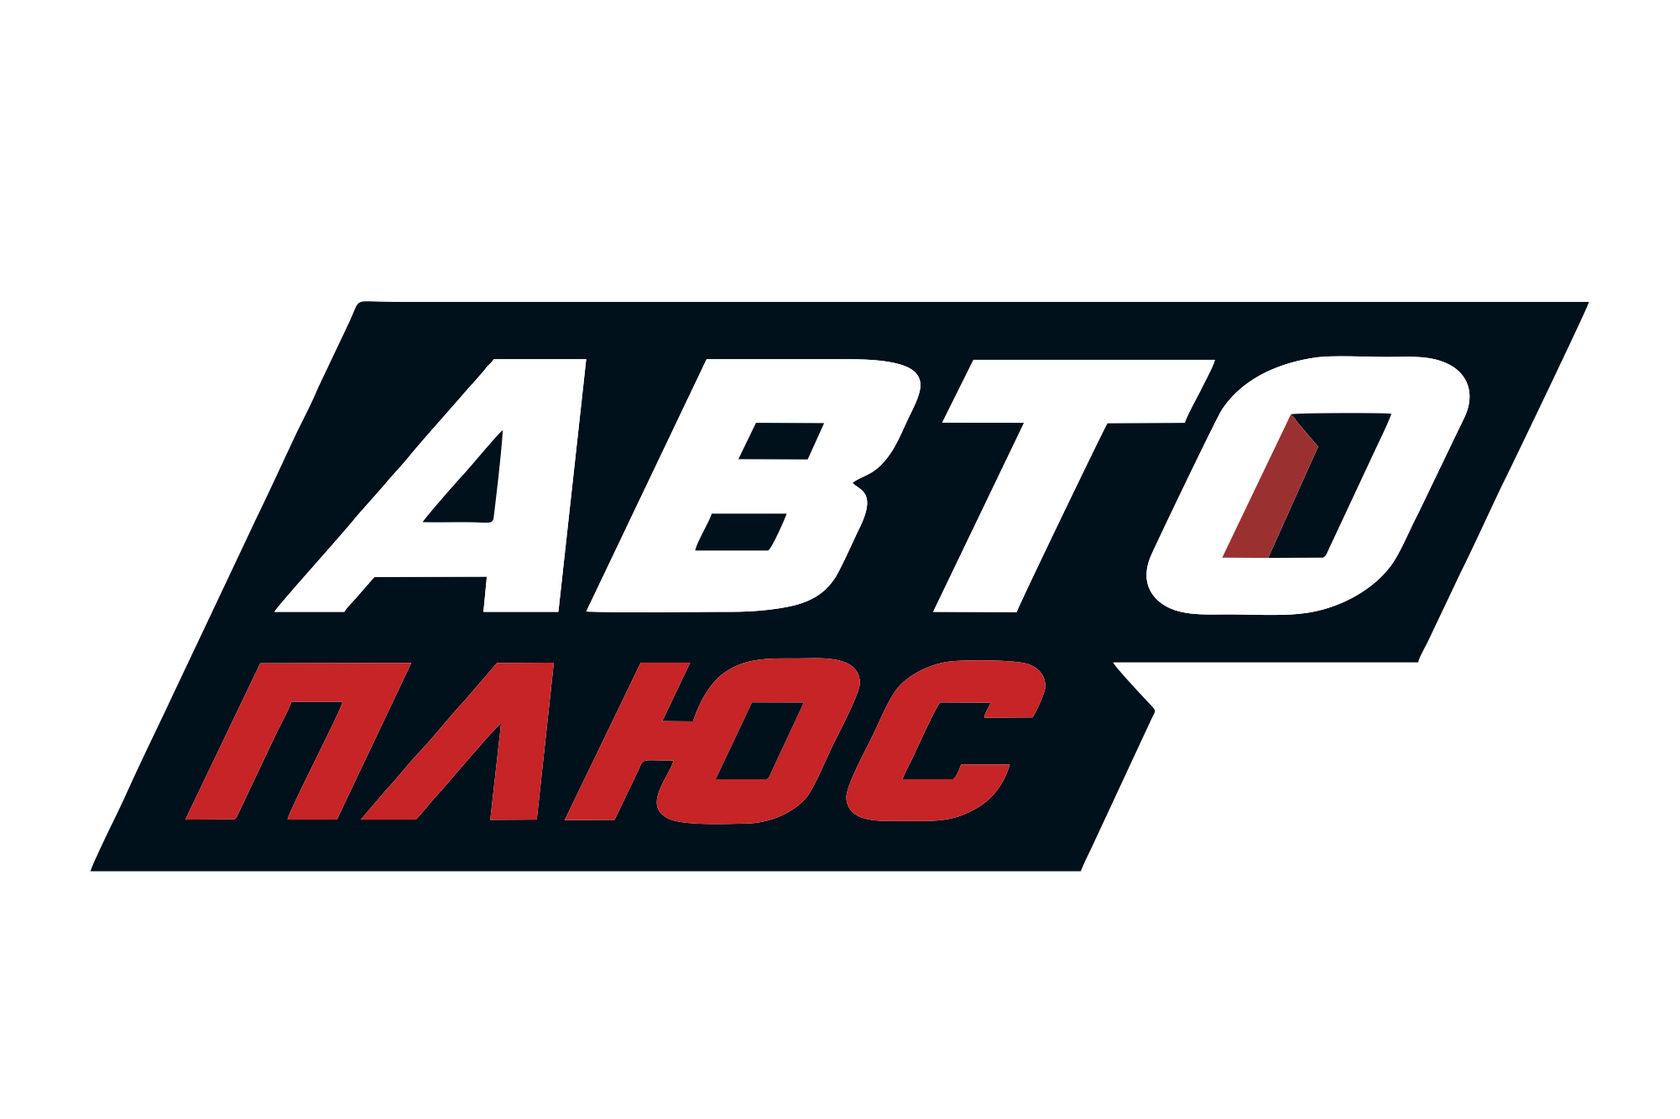 Авто Плюс TVIP Media